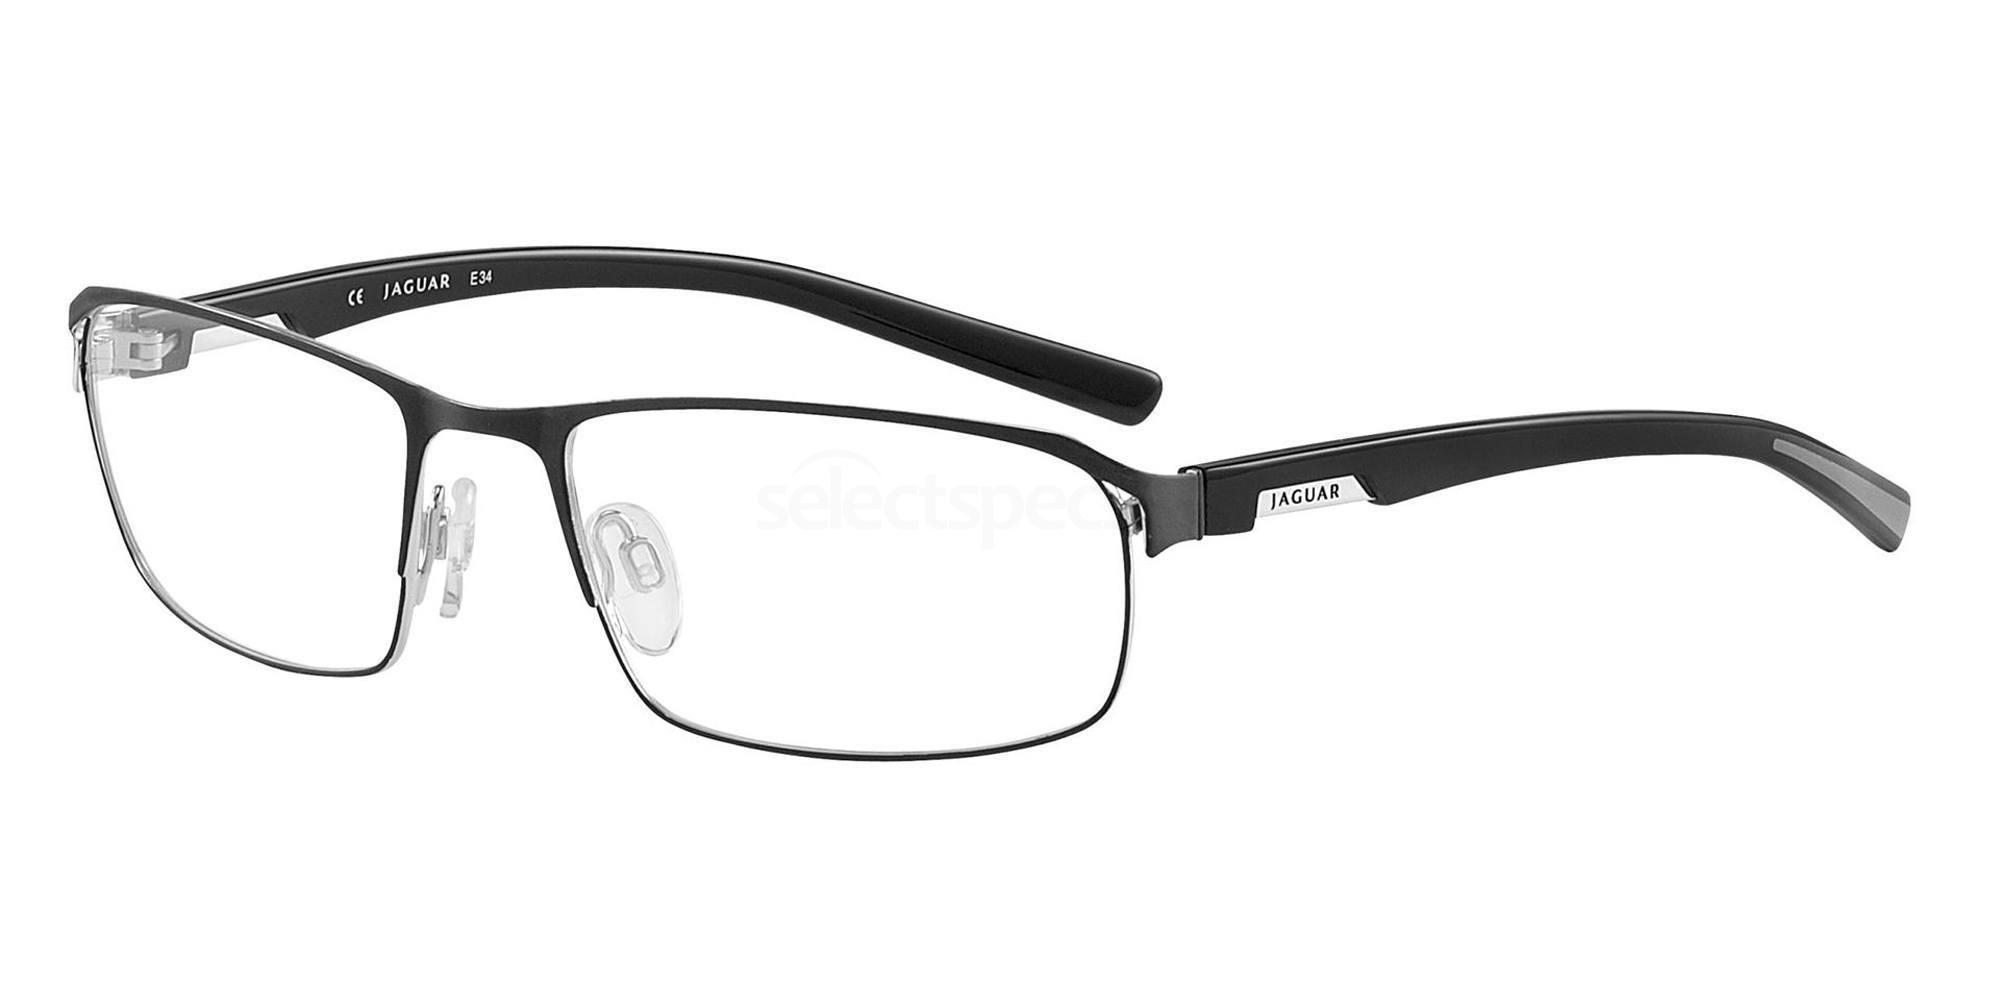 610 33555 Glasses, JAGUAR Eyewear